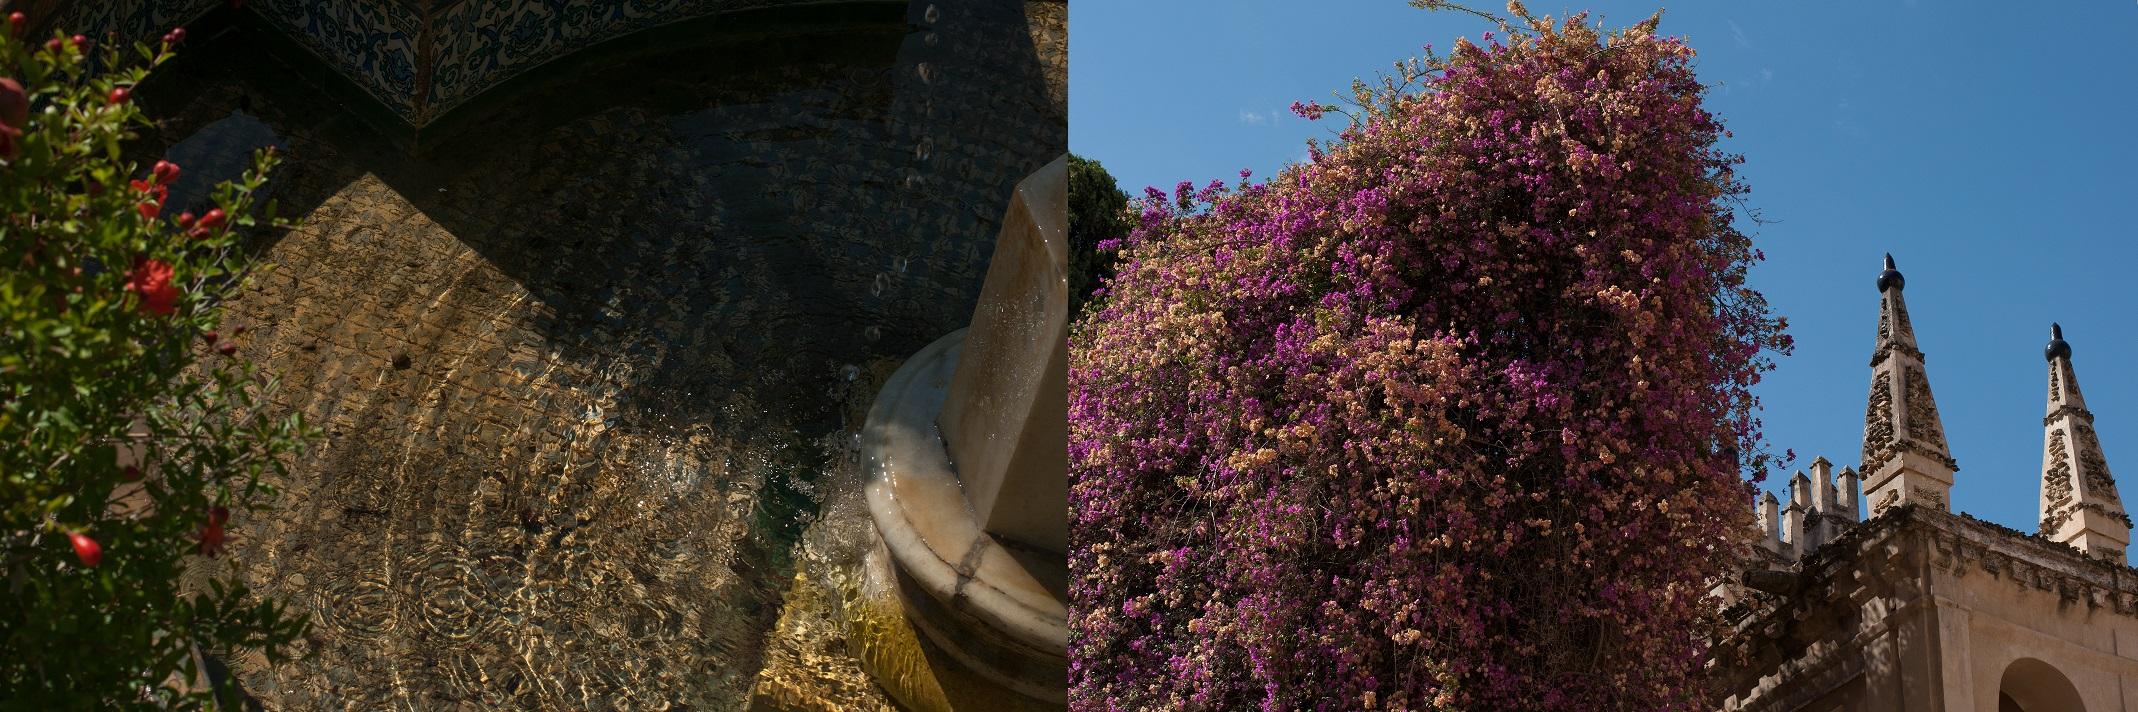 jardins-alcazar